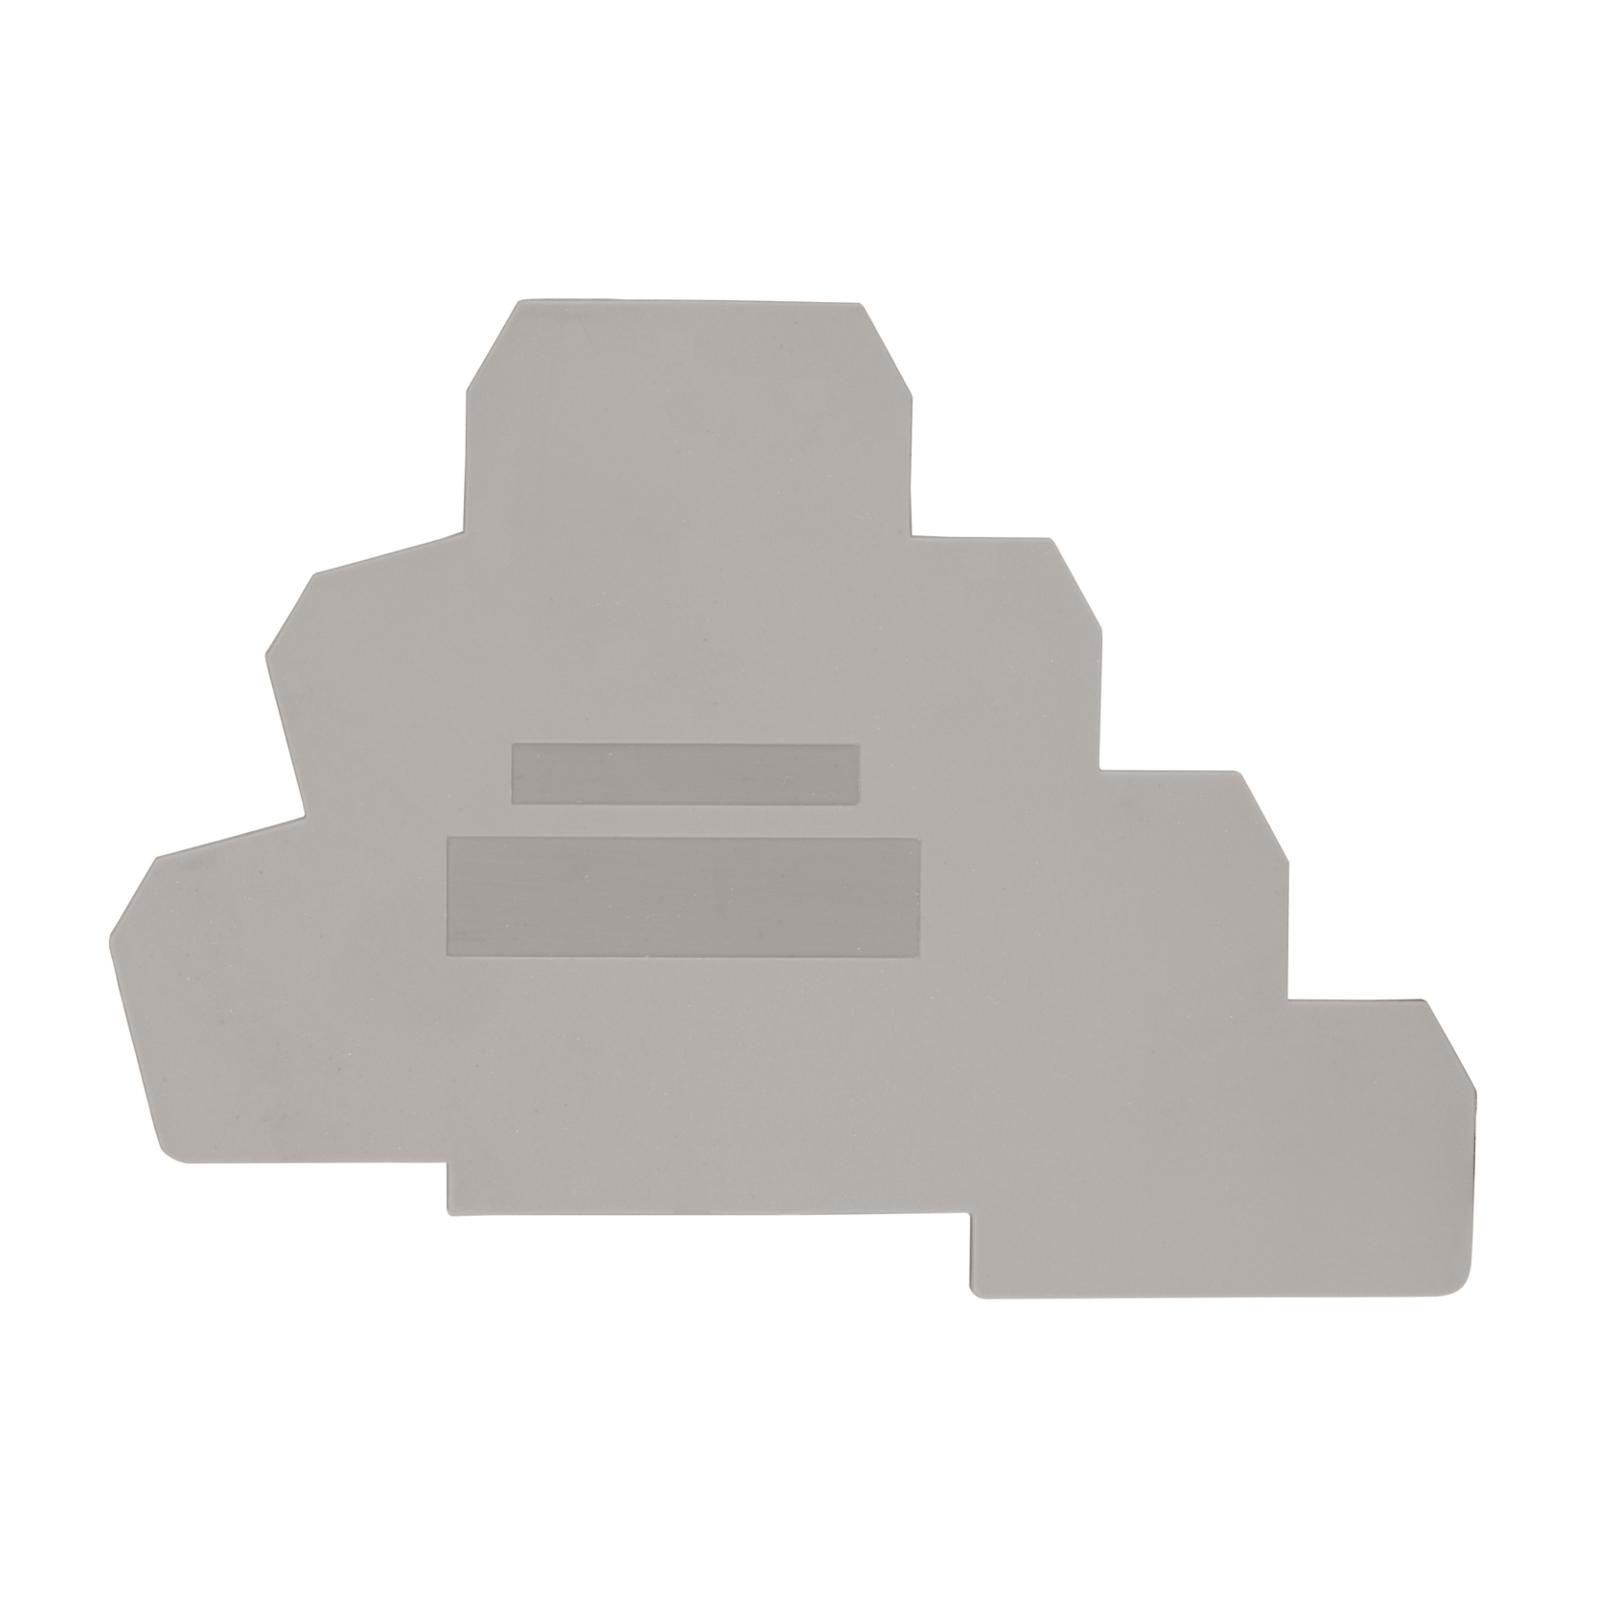 1 Stk Endplatte für Dreistockklemme PUK 3 T grau IK680203--